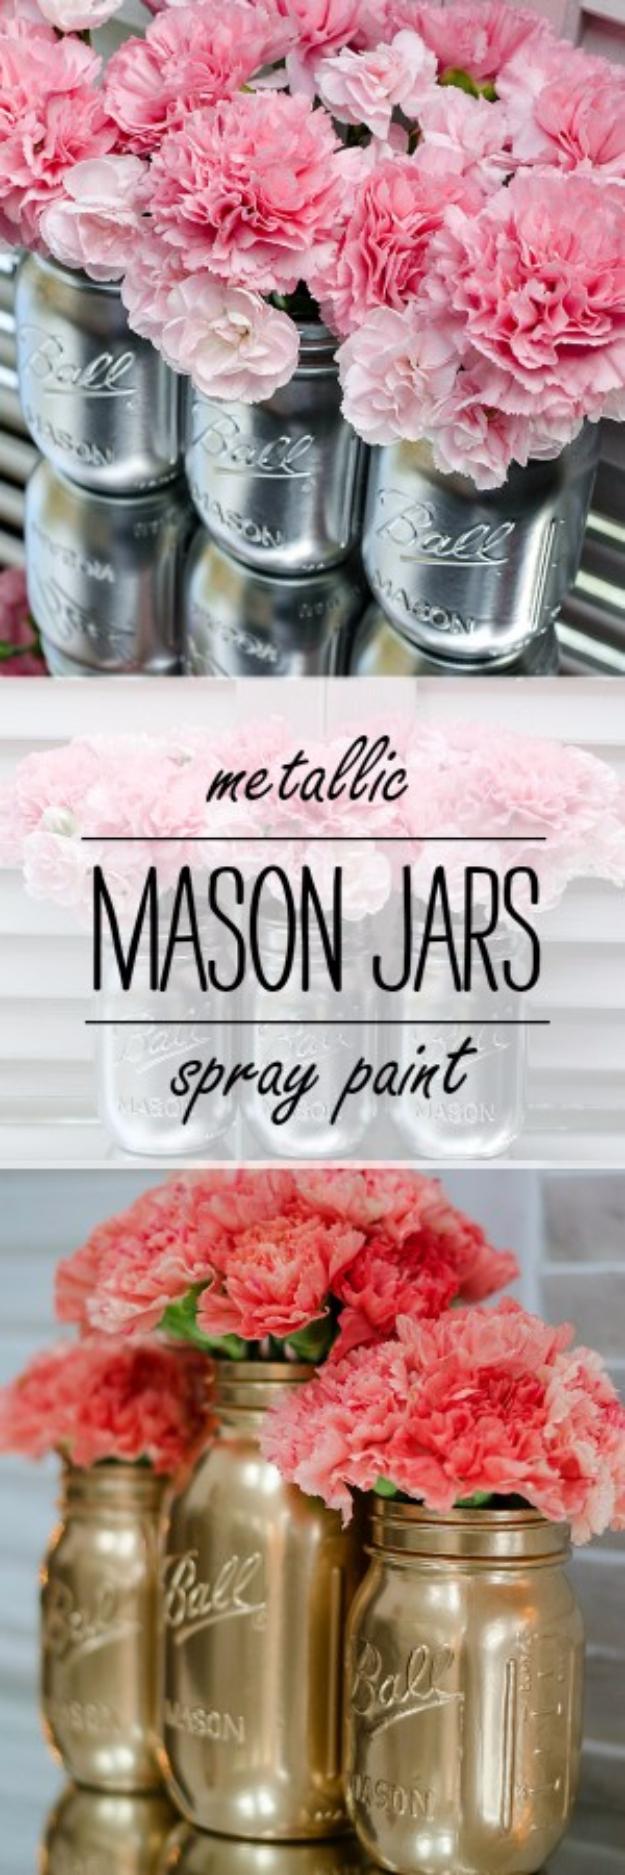 DIY Mason Jar Vases - Metallic Spray Paint Mason Jar Vases - Best Vase Projects and Ideas for Mason Jars - Painted, Wedding, Hanging Flowers, Centerpiece, Rustic Burlap, Ribbon and Twine